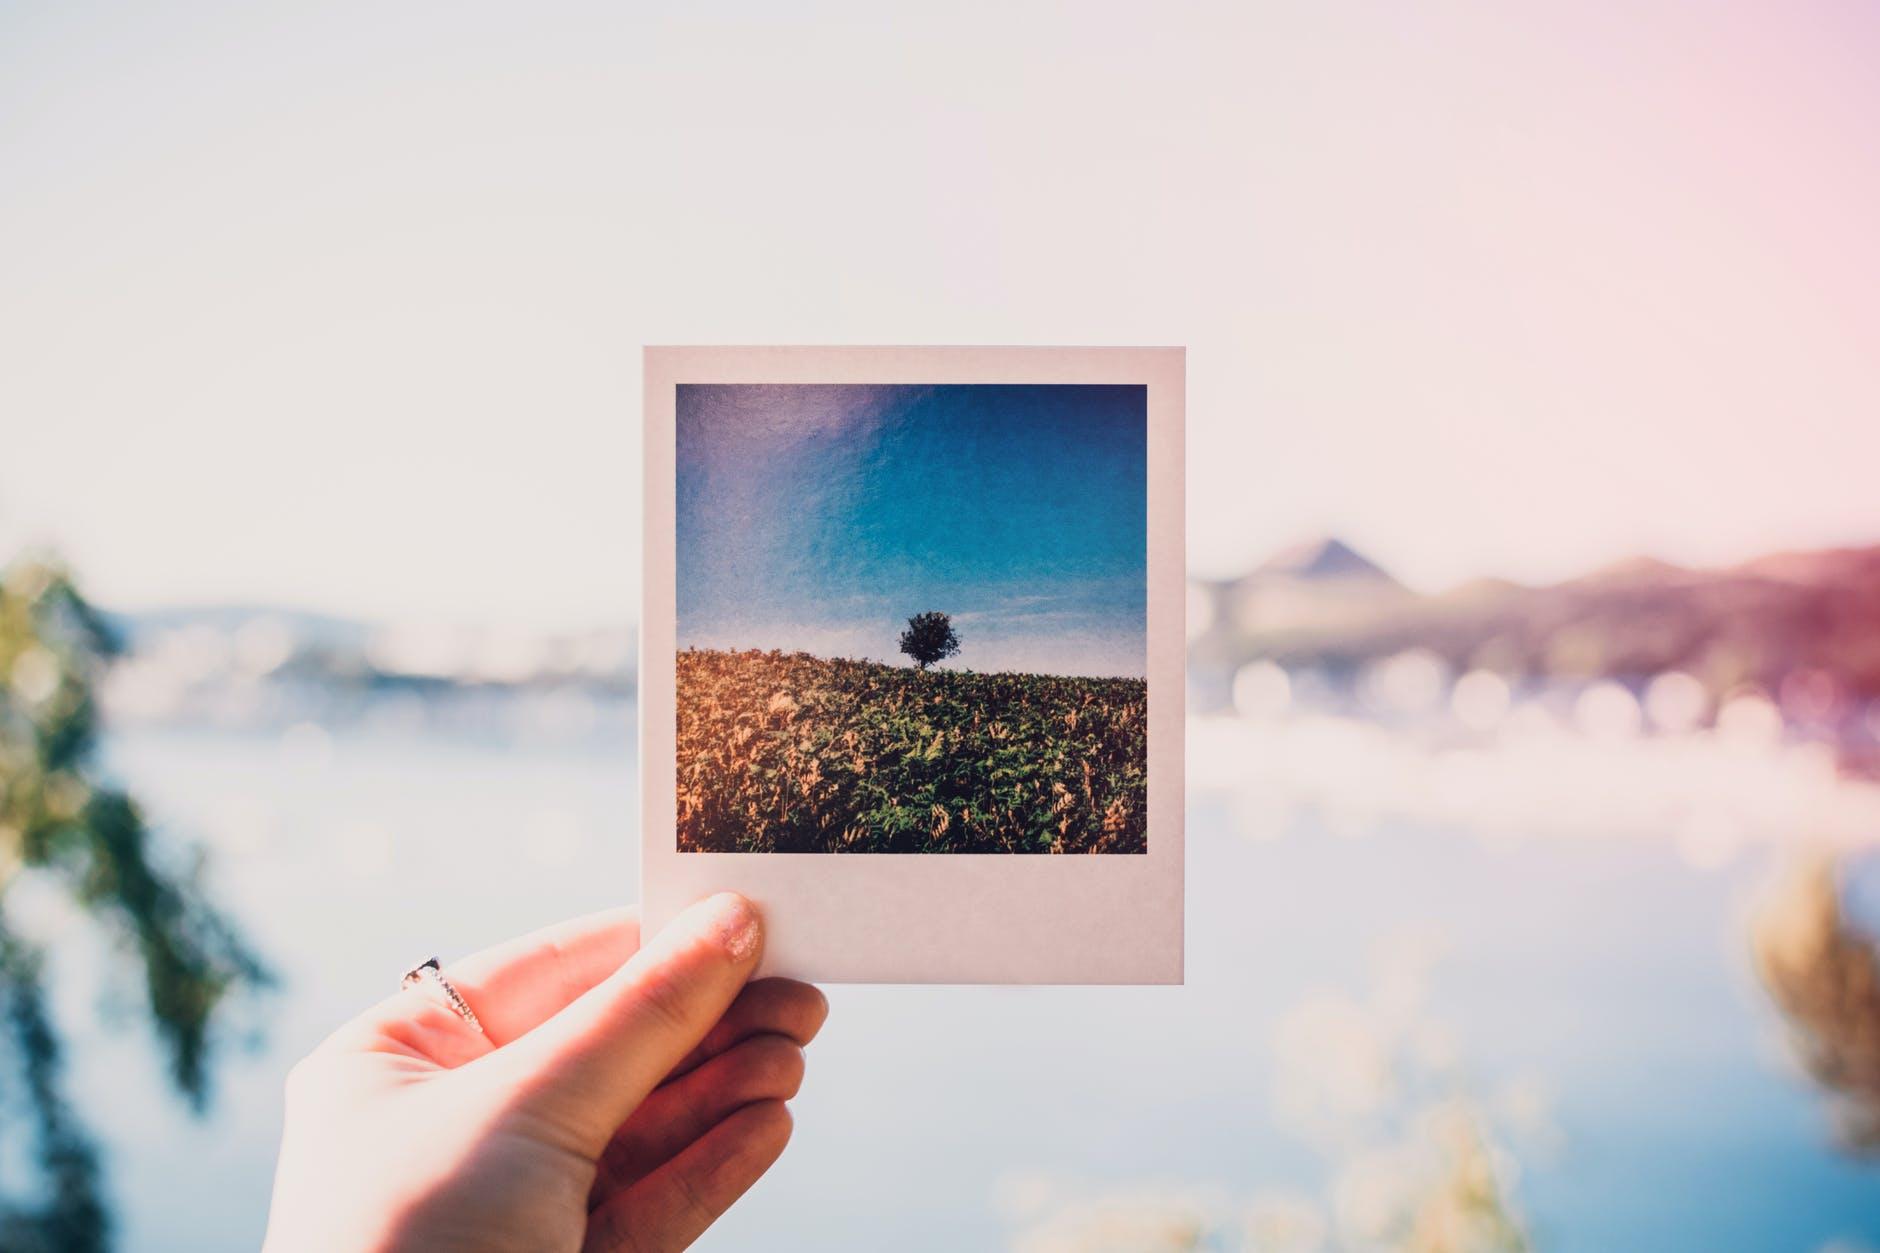 pexels-photo-1252983.jpeg